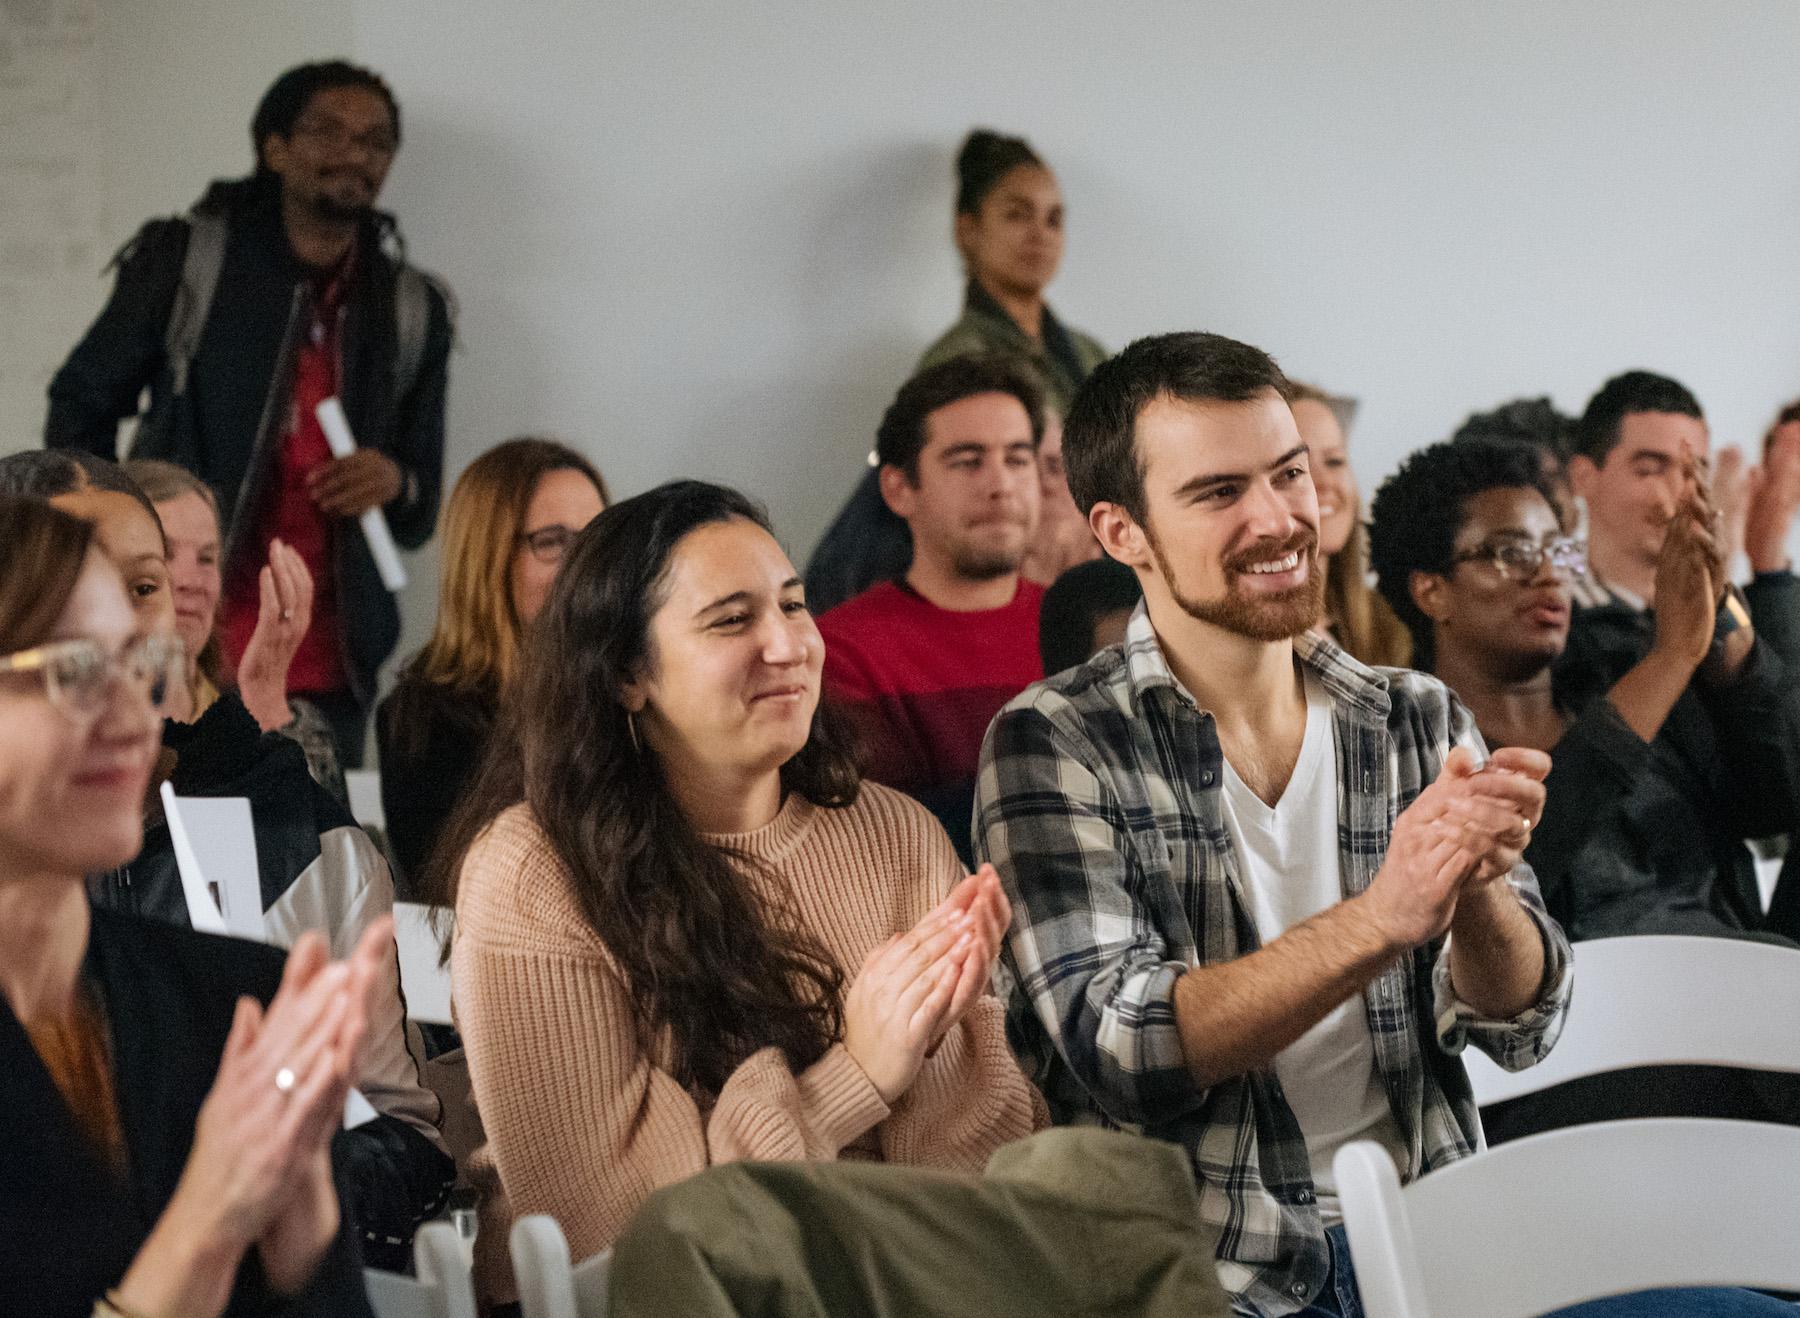 Gigsy; 2019-01-25; Camelback Ventures - Award Presentation; 055.jpg